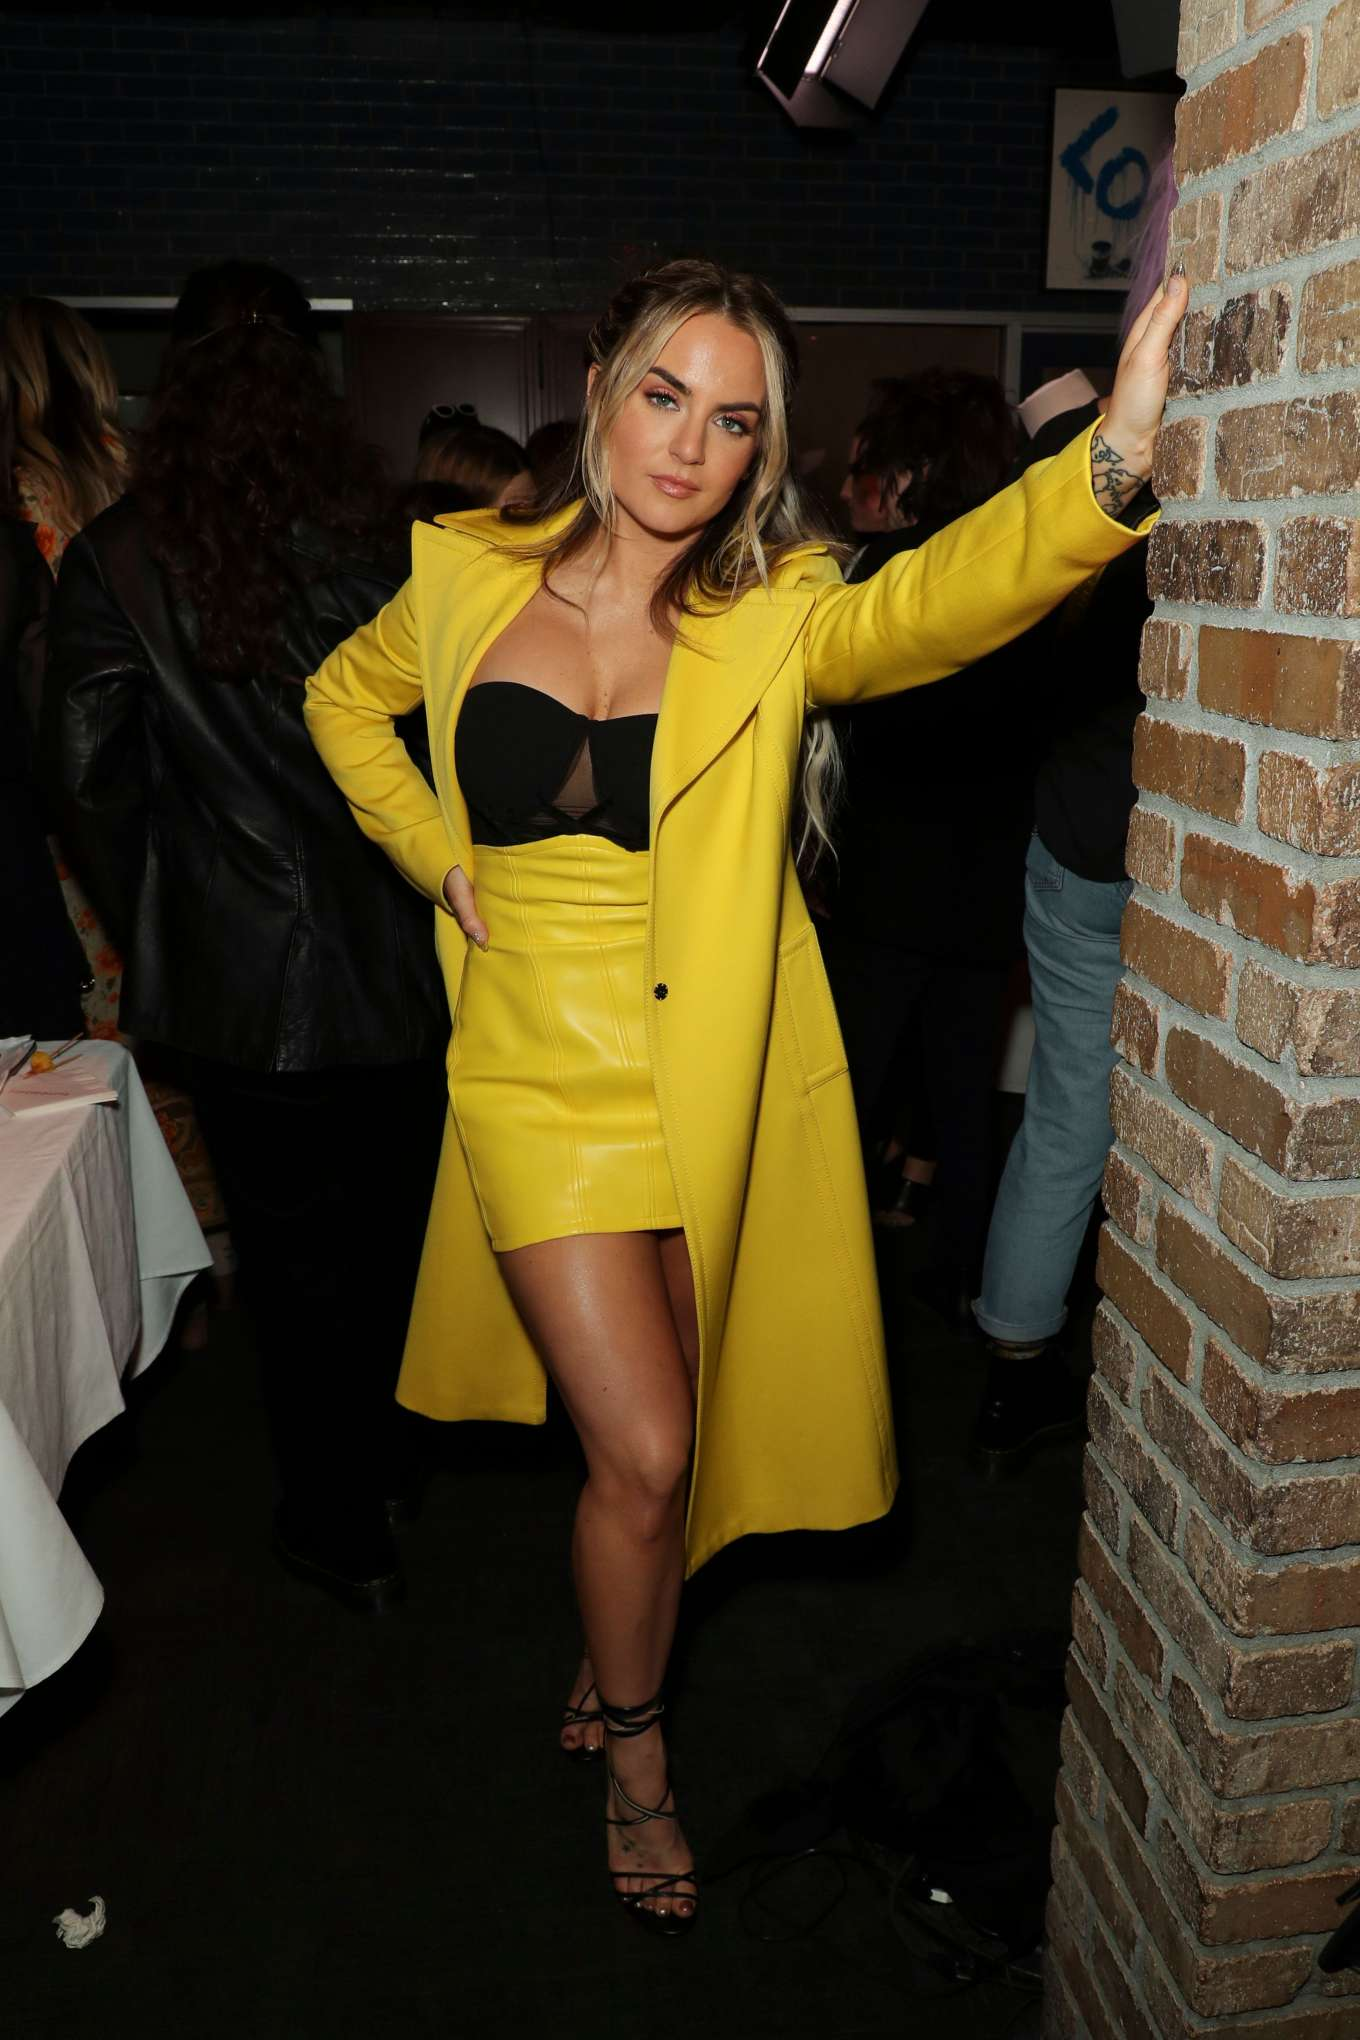 Joanna JoJo Levesque 2020 : Joanna JoJo Levesque – 3rd Annual Women in Harmony Pre-Grammy Luncheon-09